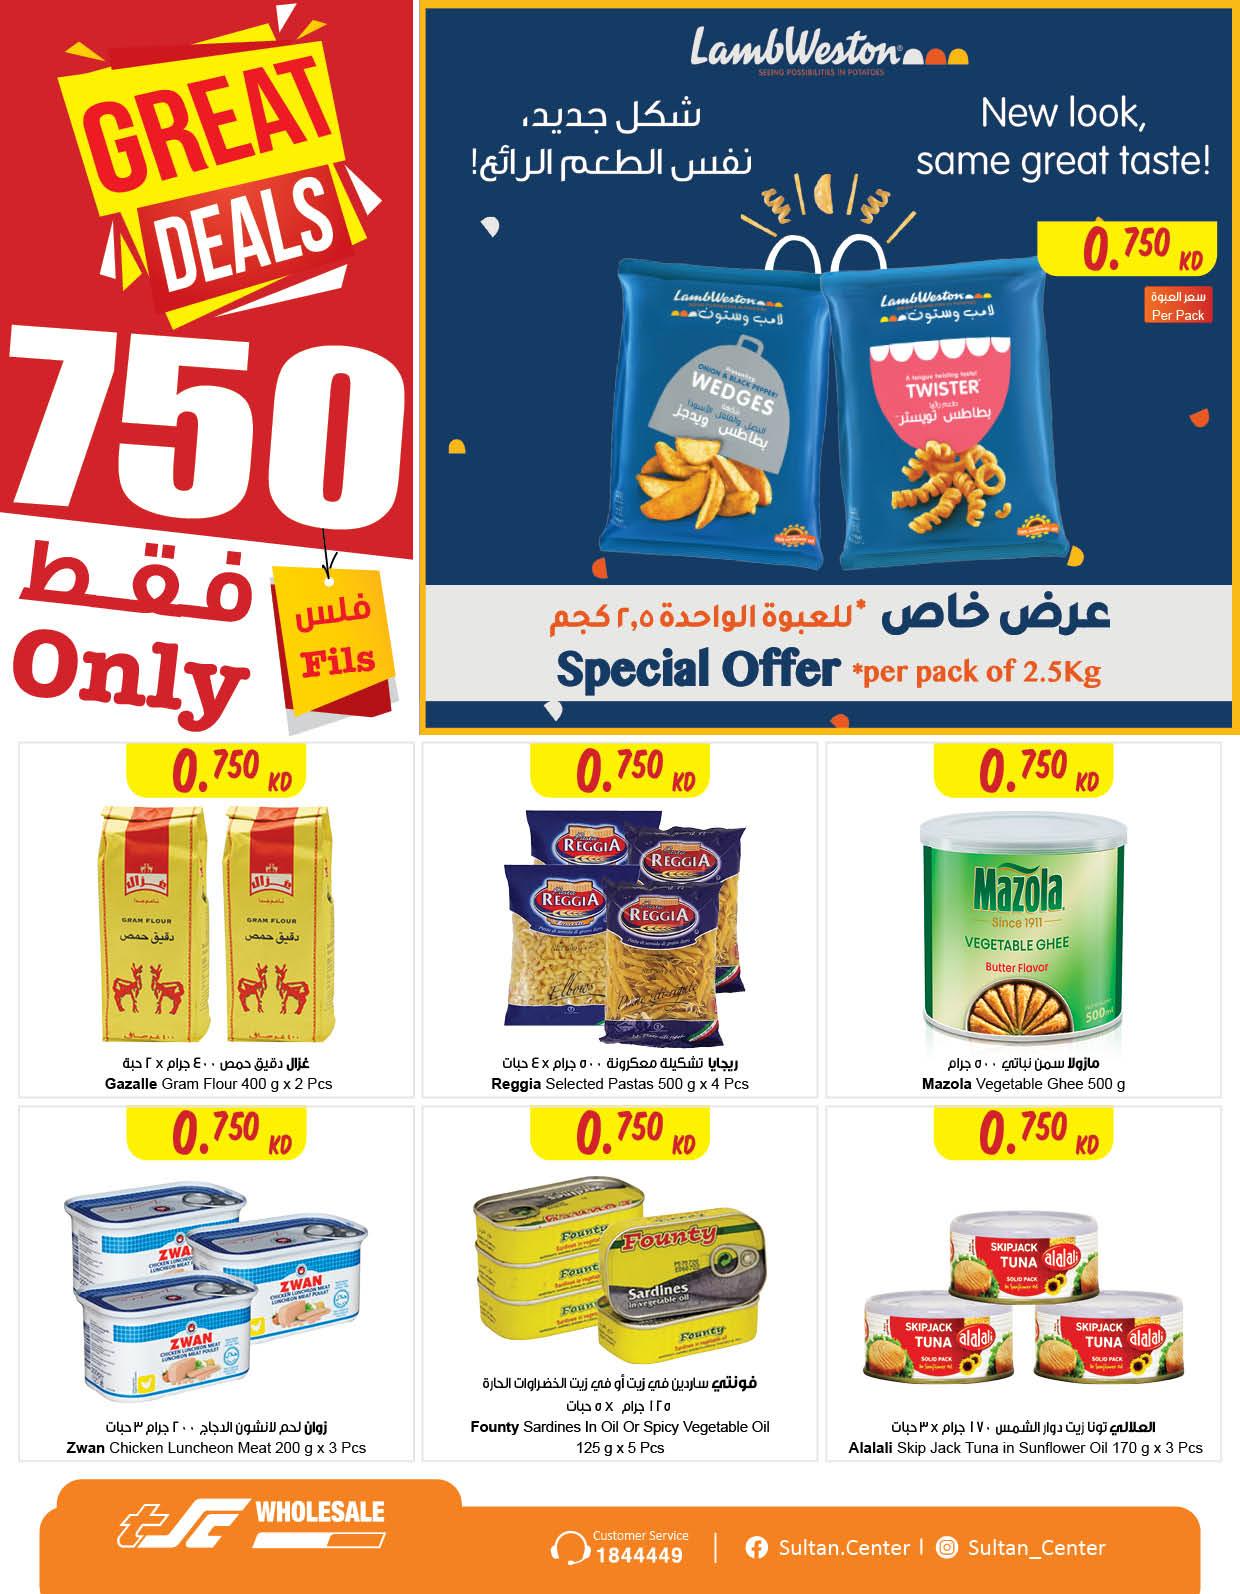 Sultan Center Weekly promotions, iiQ8, Deals in Sultan Centre Kuwait Jan 2021 3